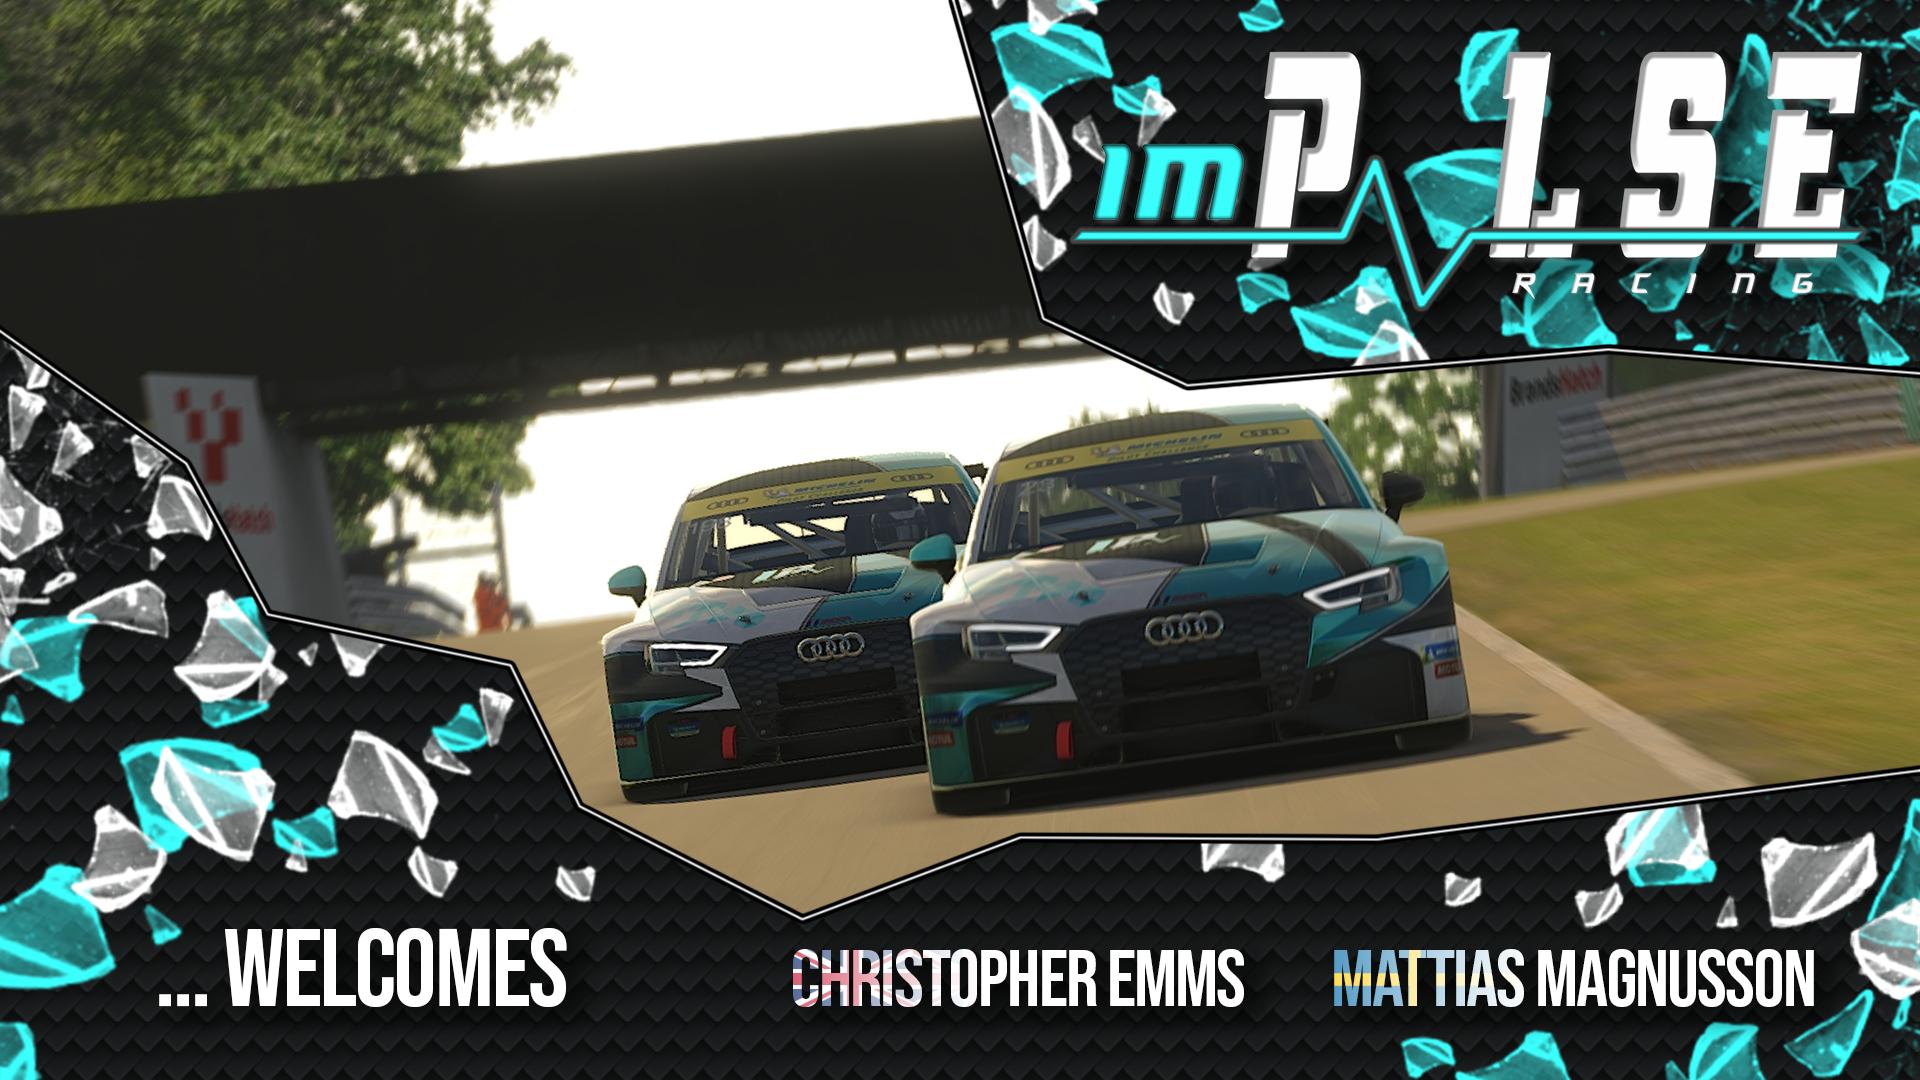 Welcome Christopher and Mattias